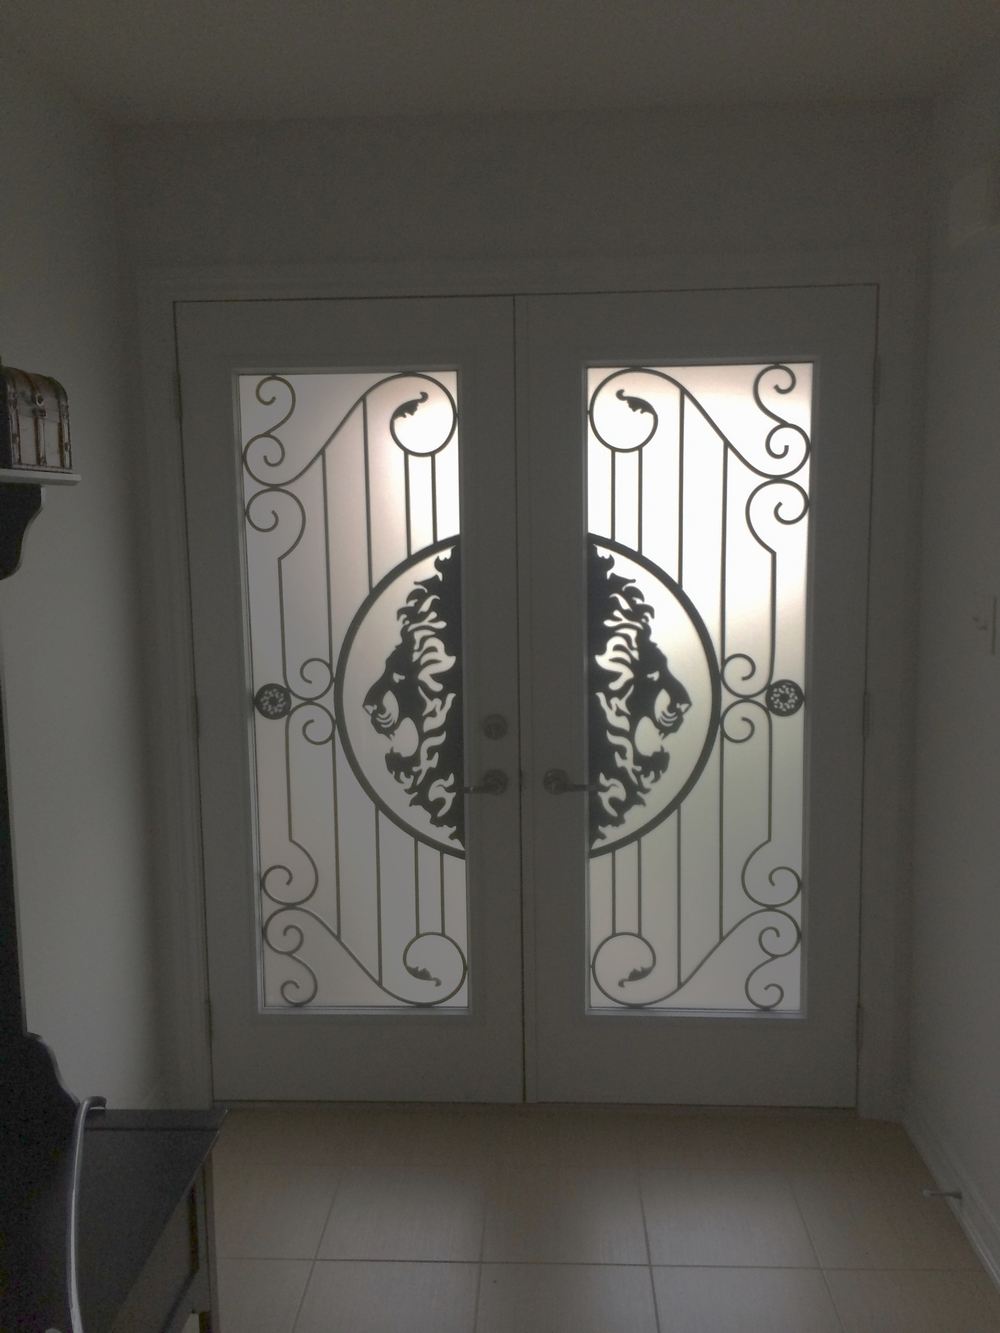 Thunderbay-wrought-iron-glass-door-inserts-Nobleton-ontario